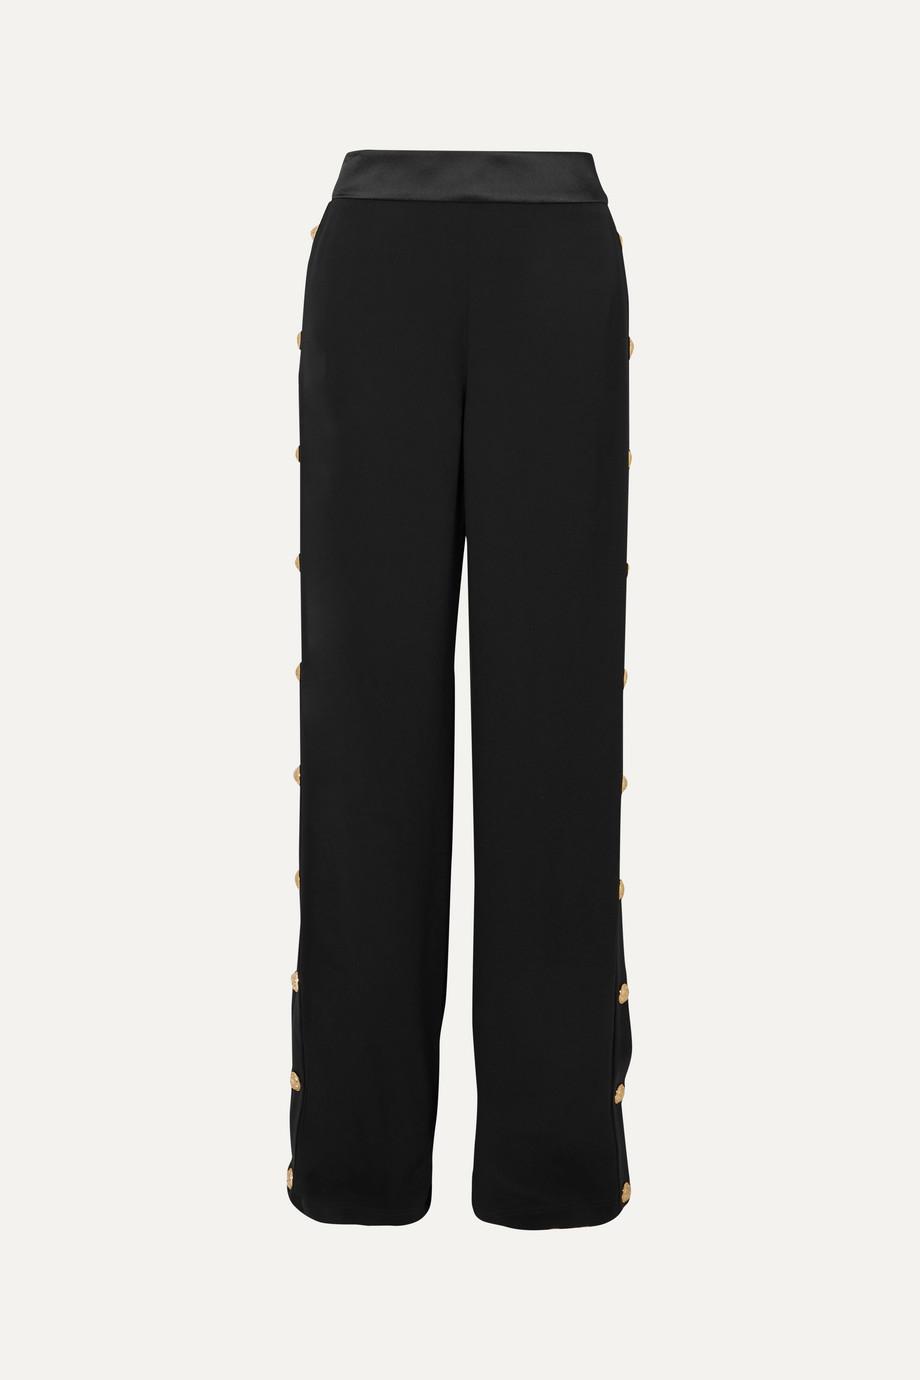 Balmain Pantalon de survêtement large en crêpe à boutons